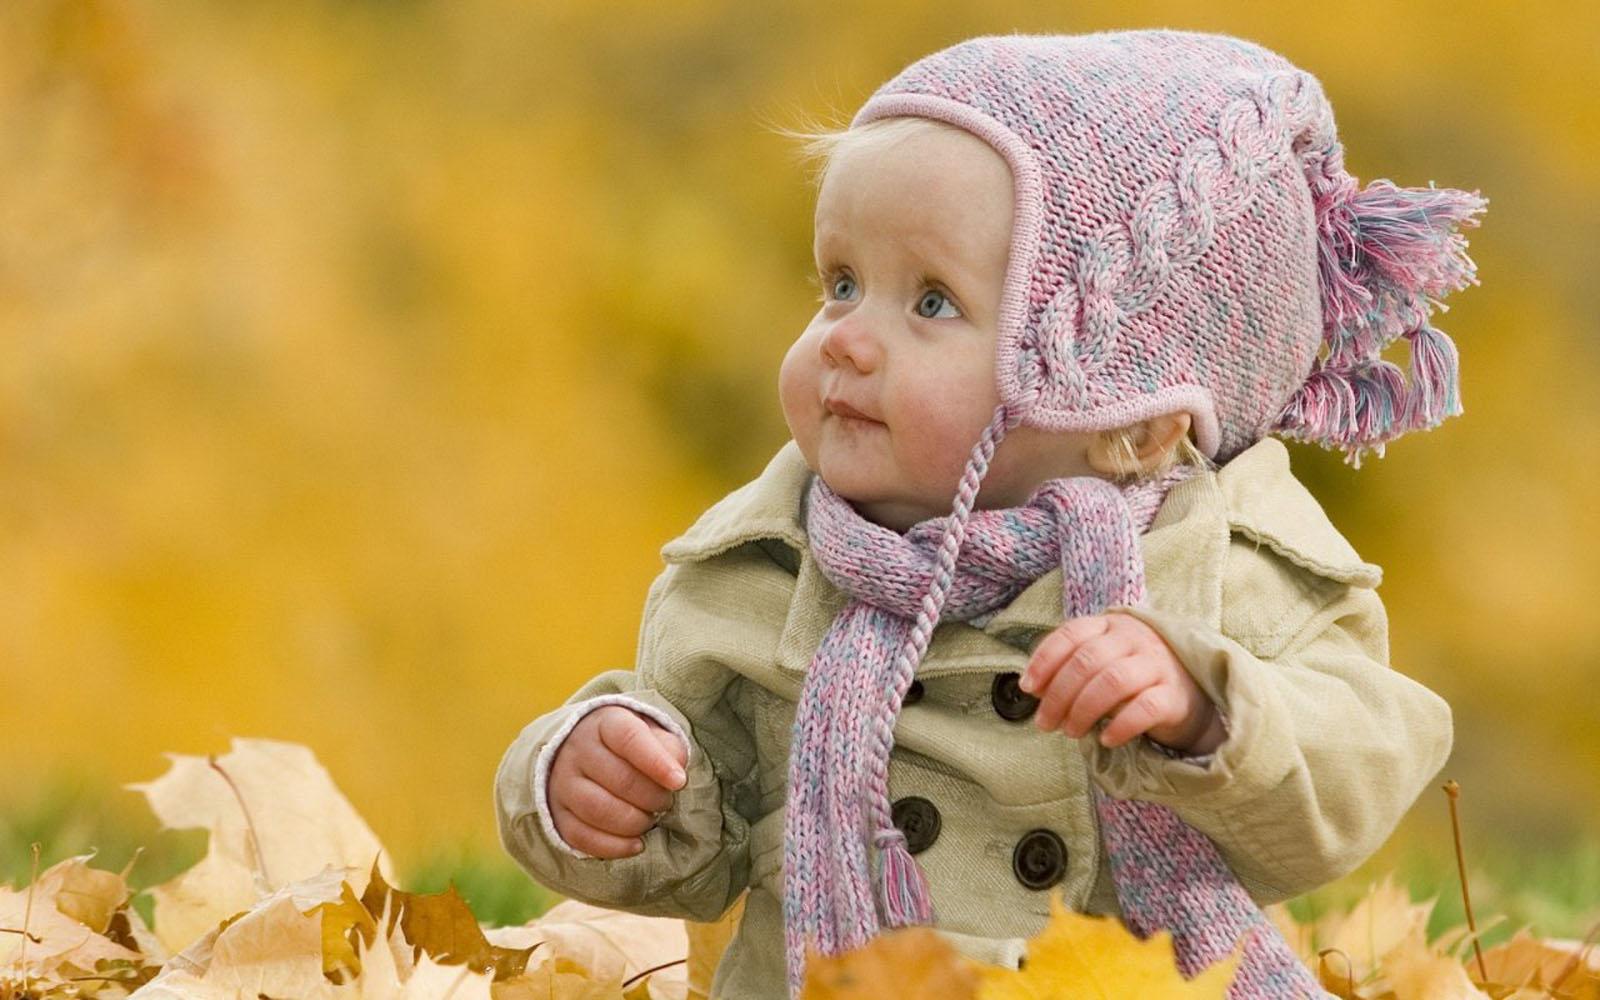 Cute babies hd wallpapers 1600x1000